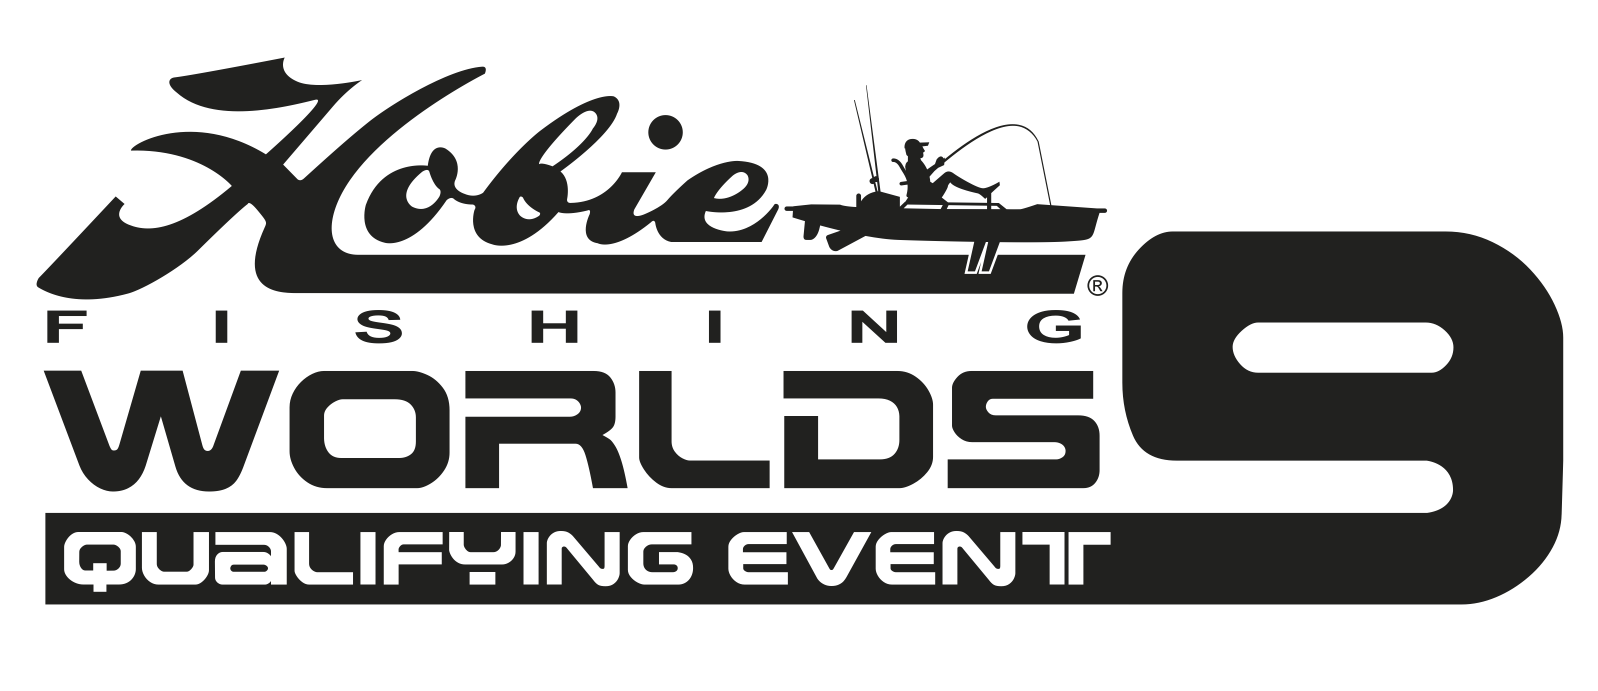 Hobie World 9 Qualifying Event